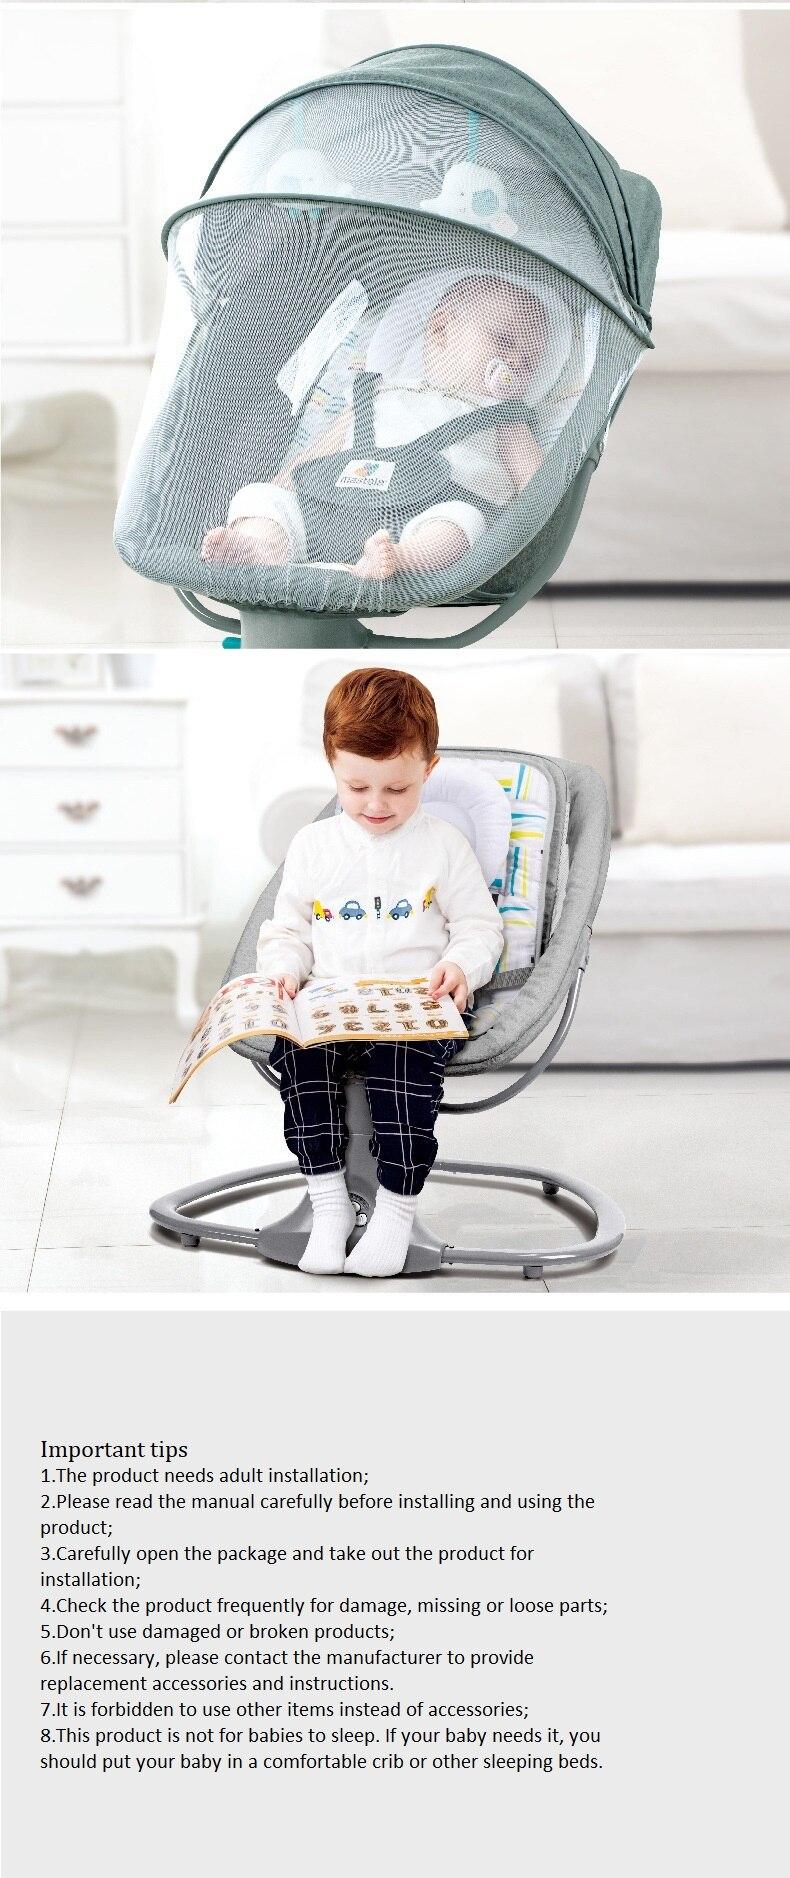 Newborns-Sleeping-Cradle-Bed-Child-comfort-chair-reclining-chair 14